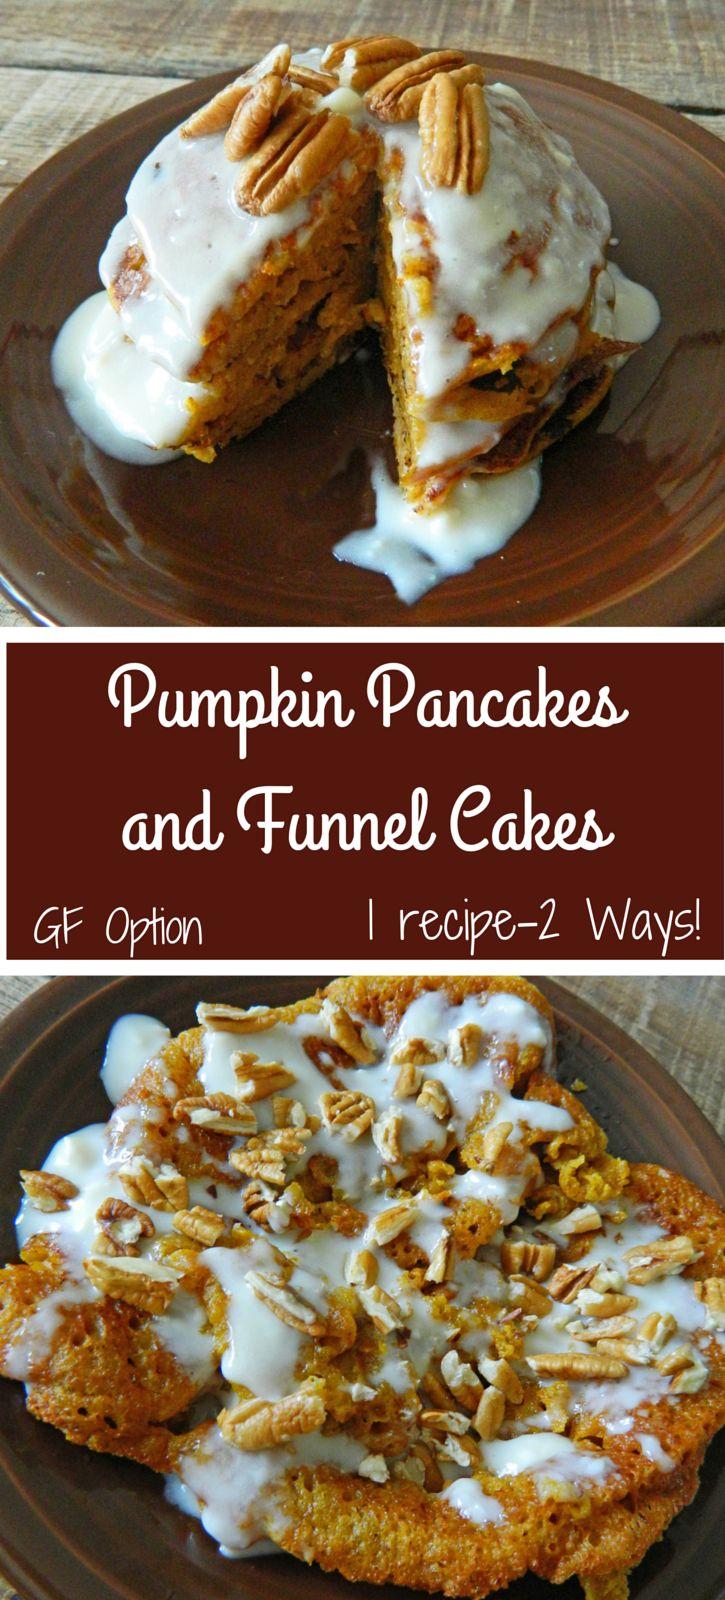 Pumpkin Pancakes & Funnel Cakes